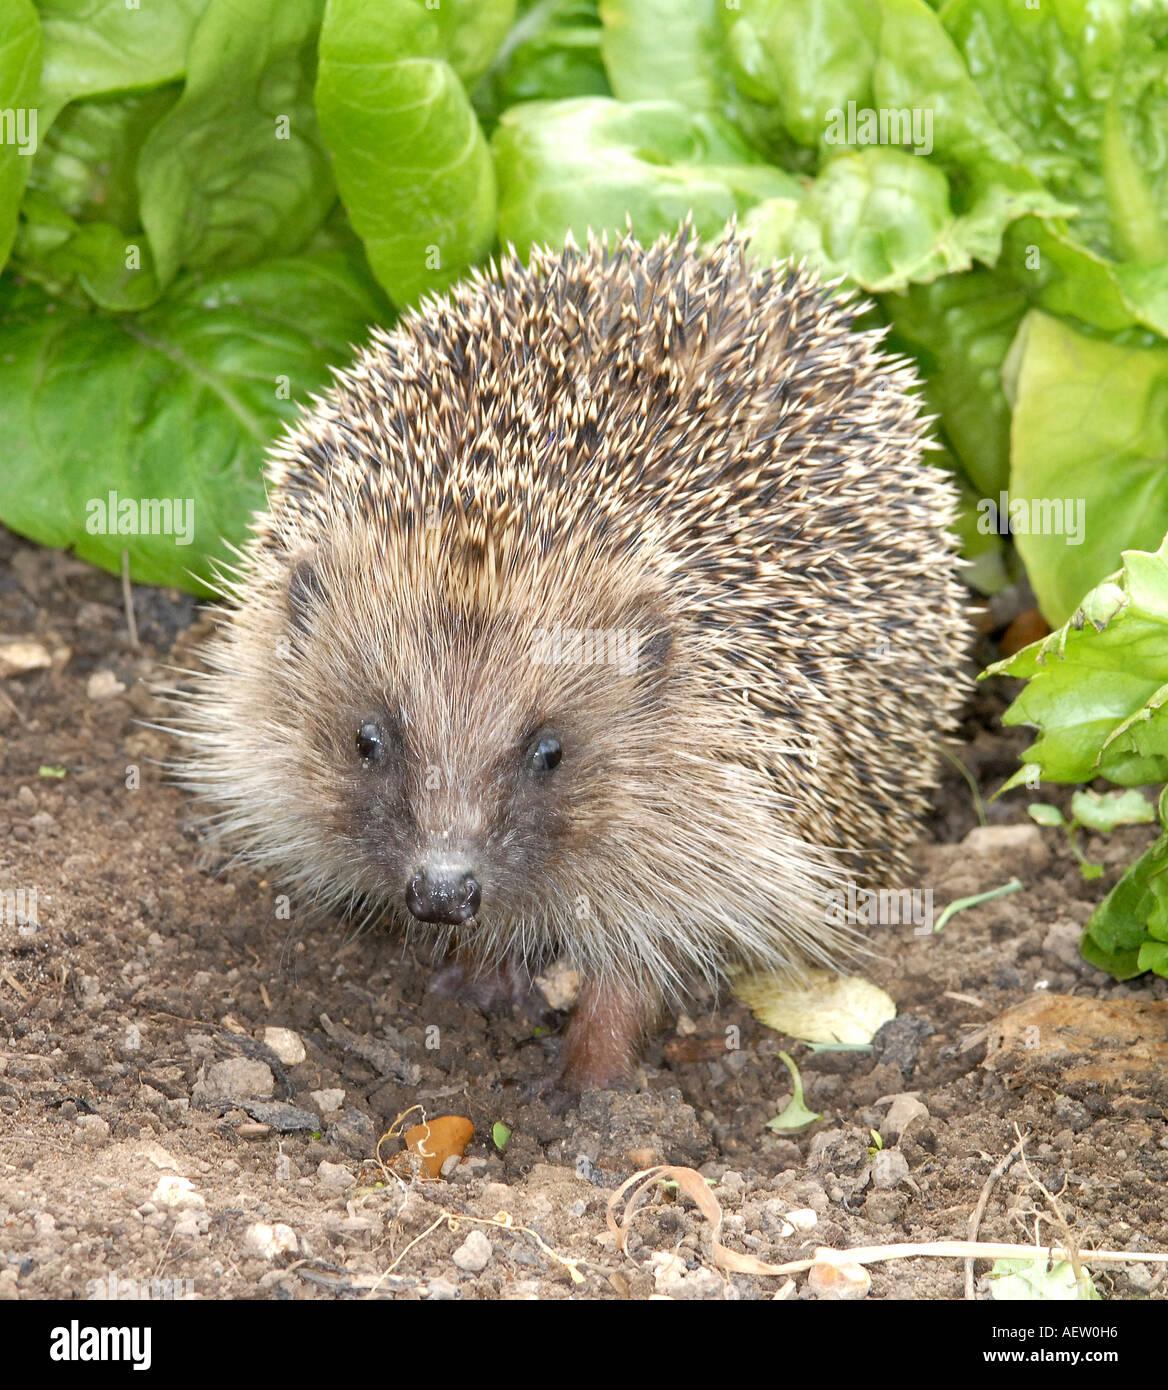 Hedgehog Erinaceus europaeus spiney coated mammal - Stock Image